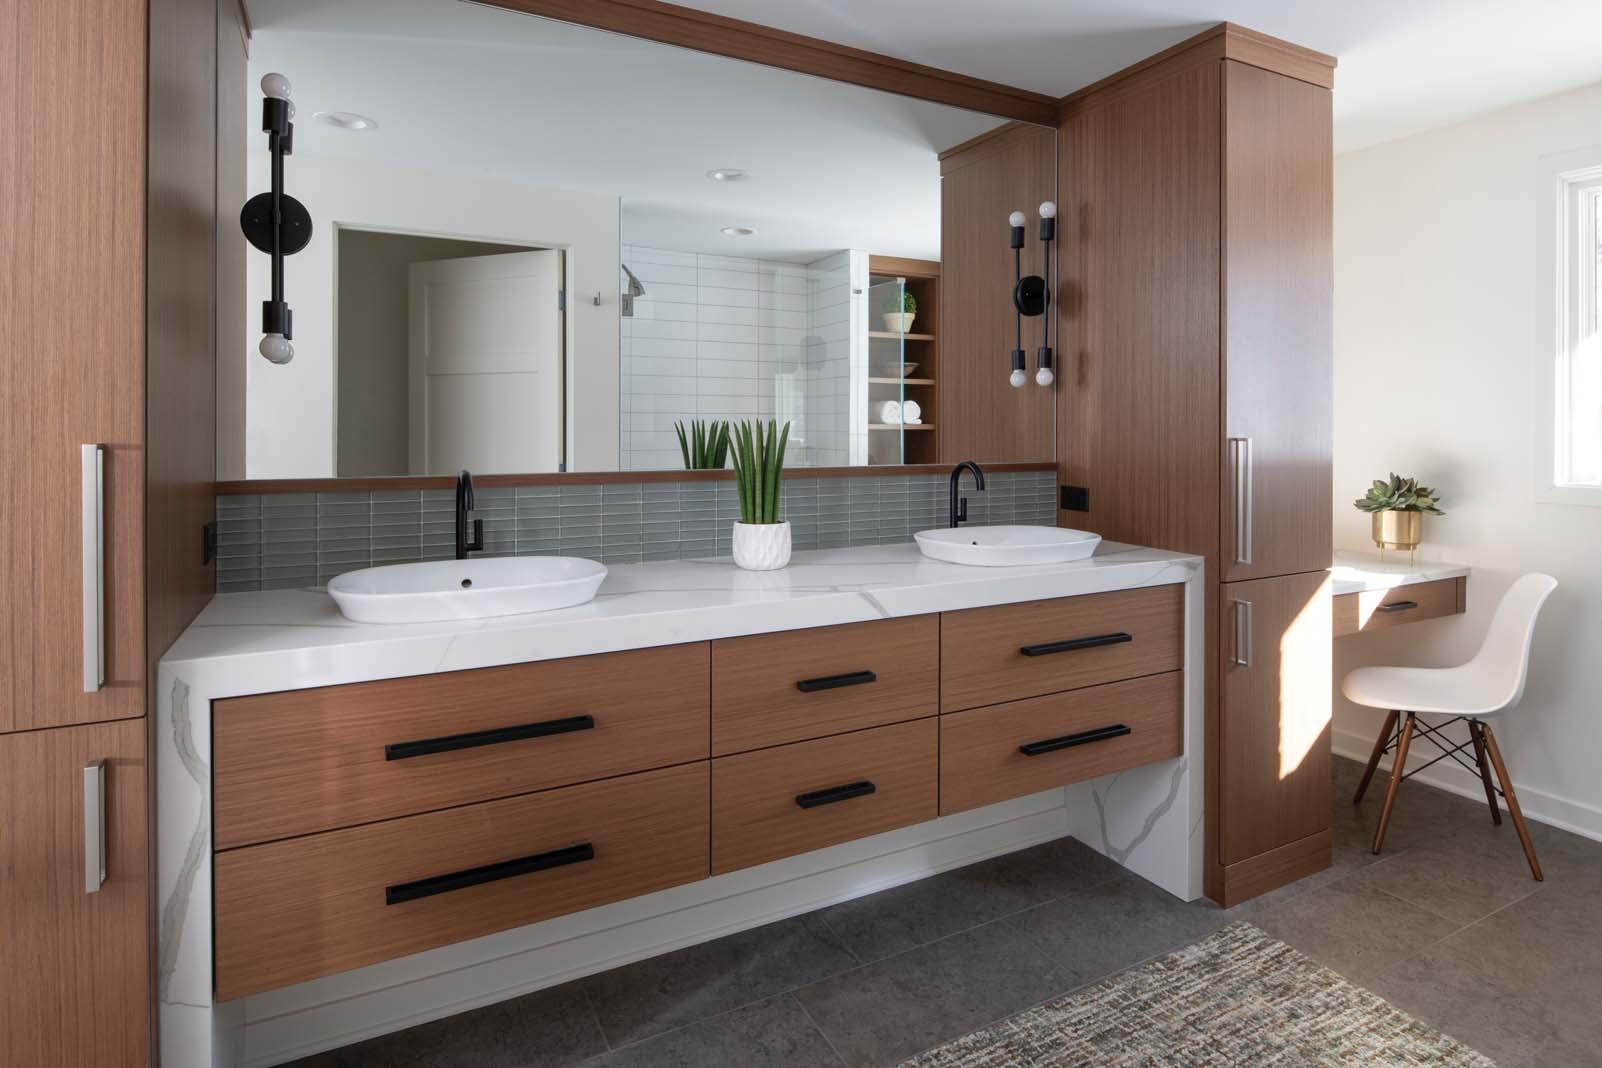 2019 National Kitchen & Bath ociation Design Awards ... on log home bathroom designs, french country bathroom designs, split level bathroom designs, farm house bathroom designs, transitional bathroom designs,